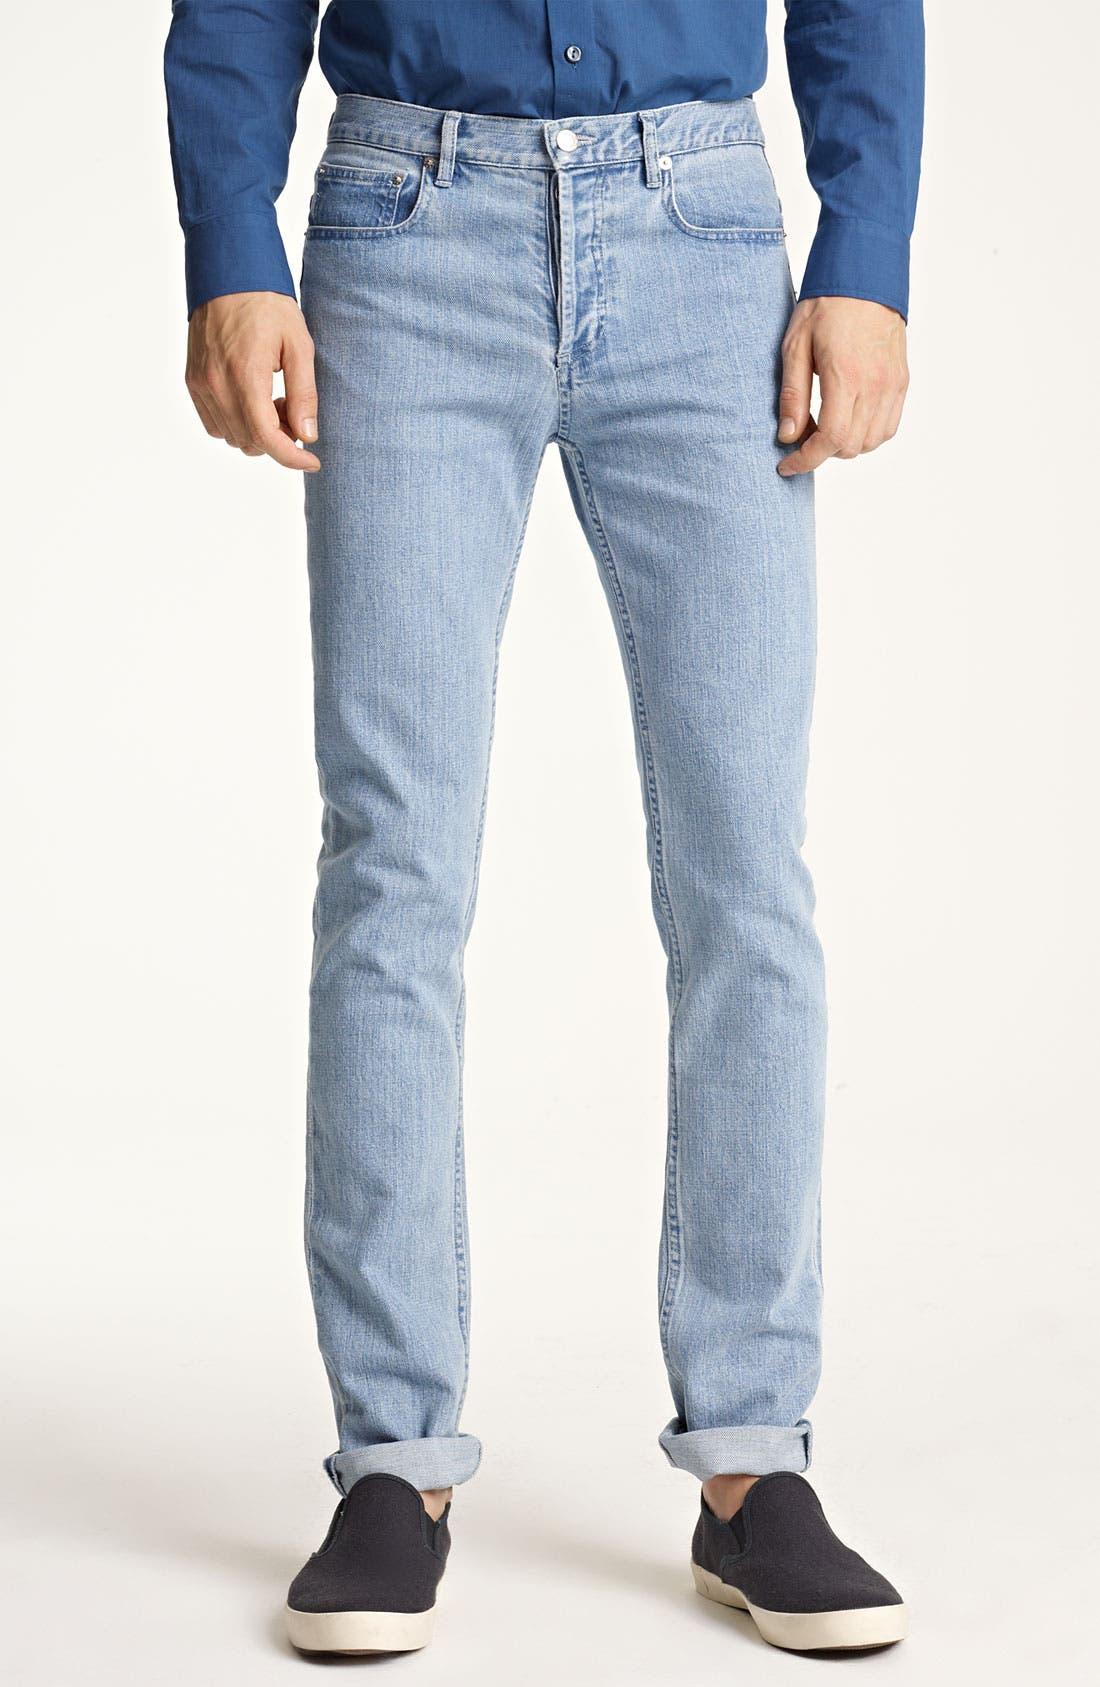 Alternate Image 1 Selected - A.P.C. 'Petit New Standard' Slim Straight Leg Jeans (Light Blue)